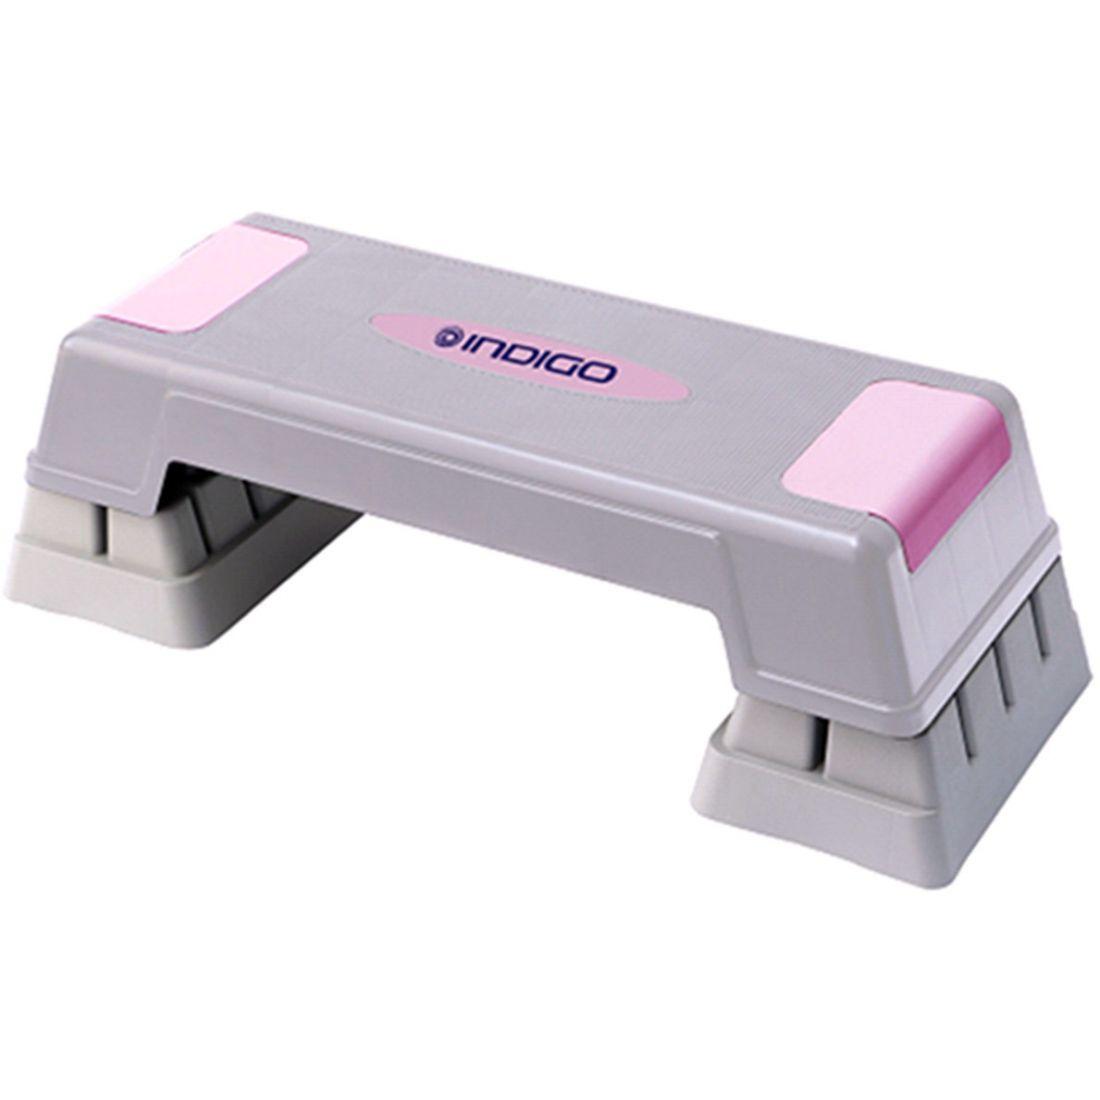 Степ-платформа для аэробики 3 уровня INDIGO IN170